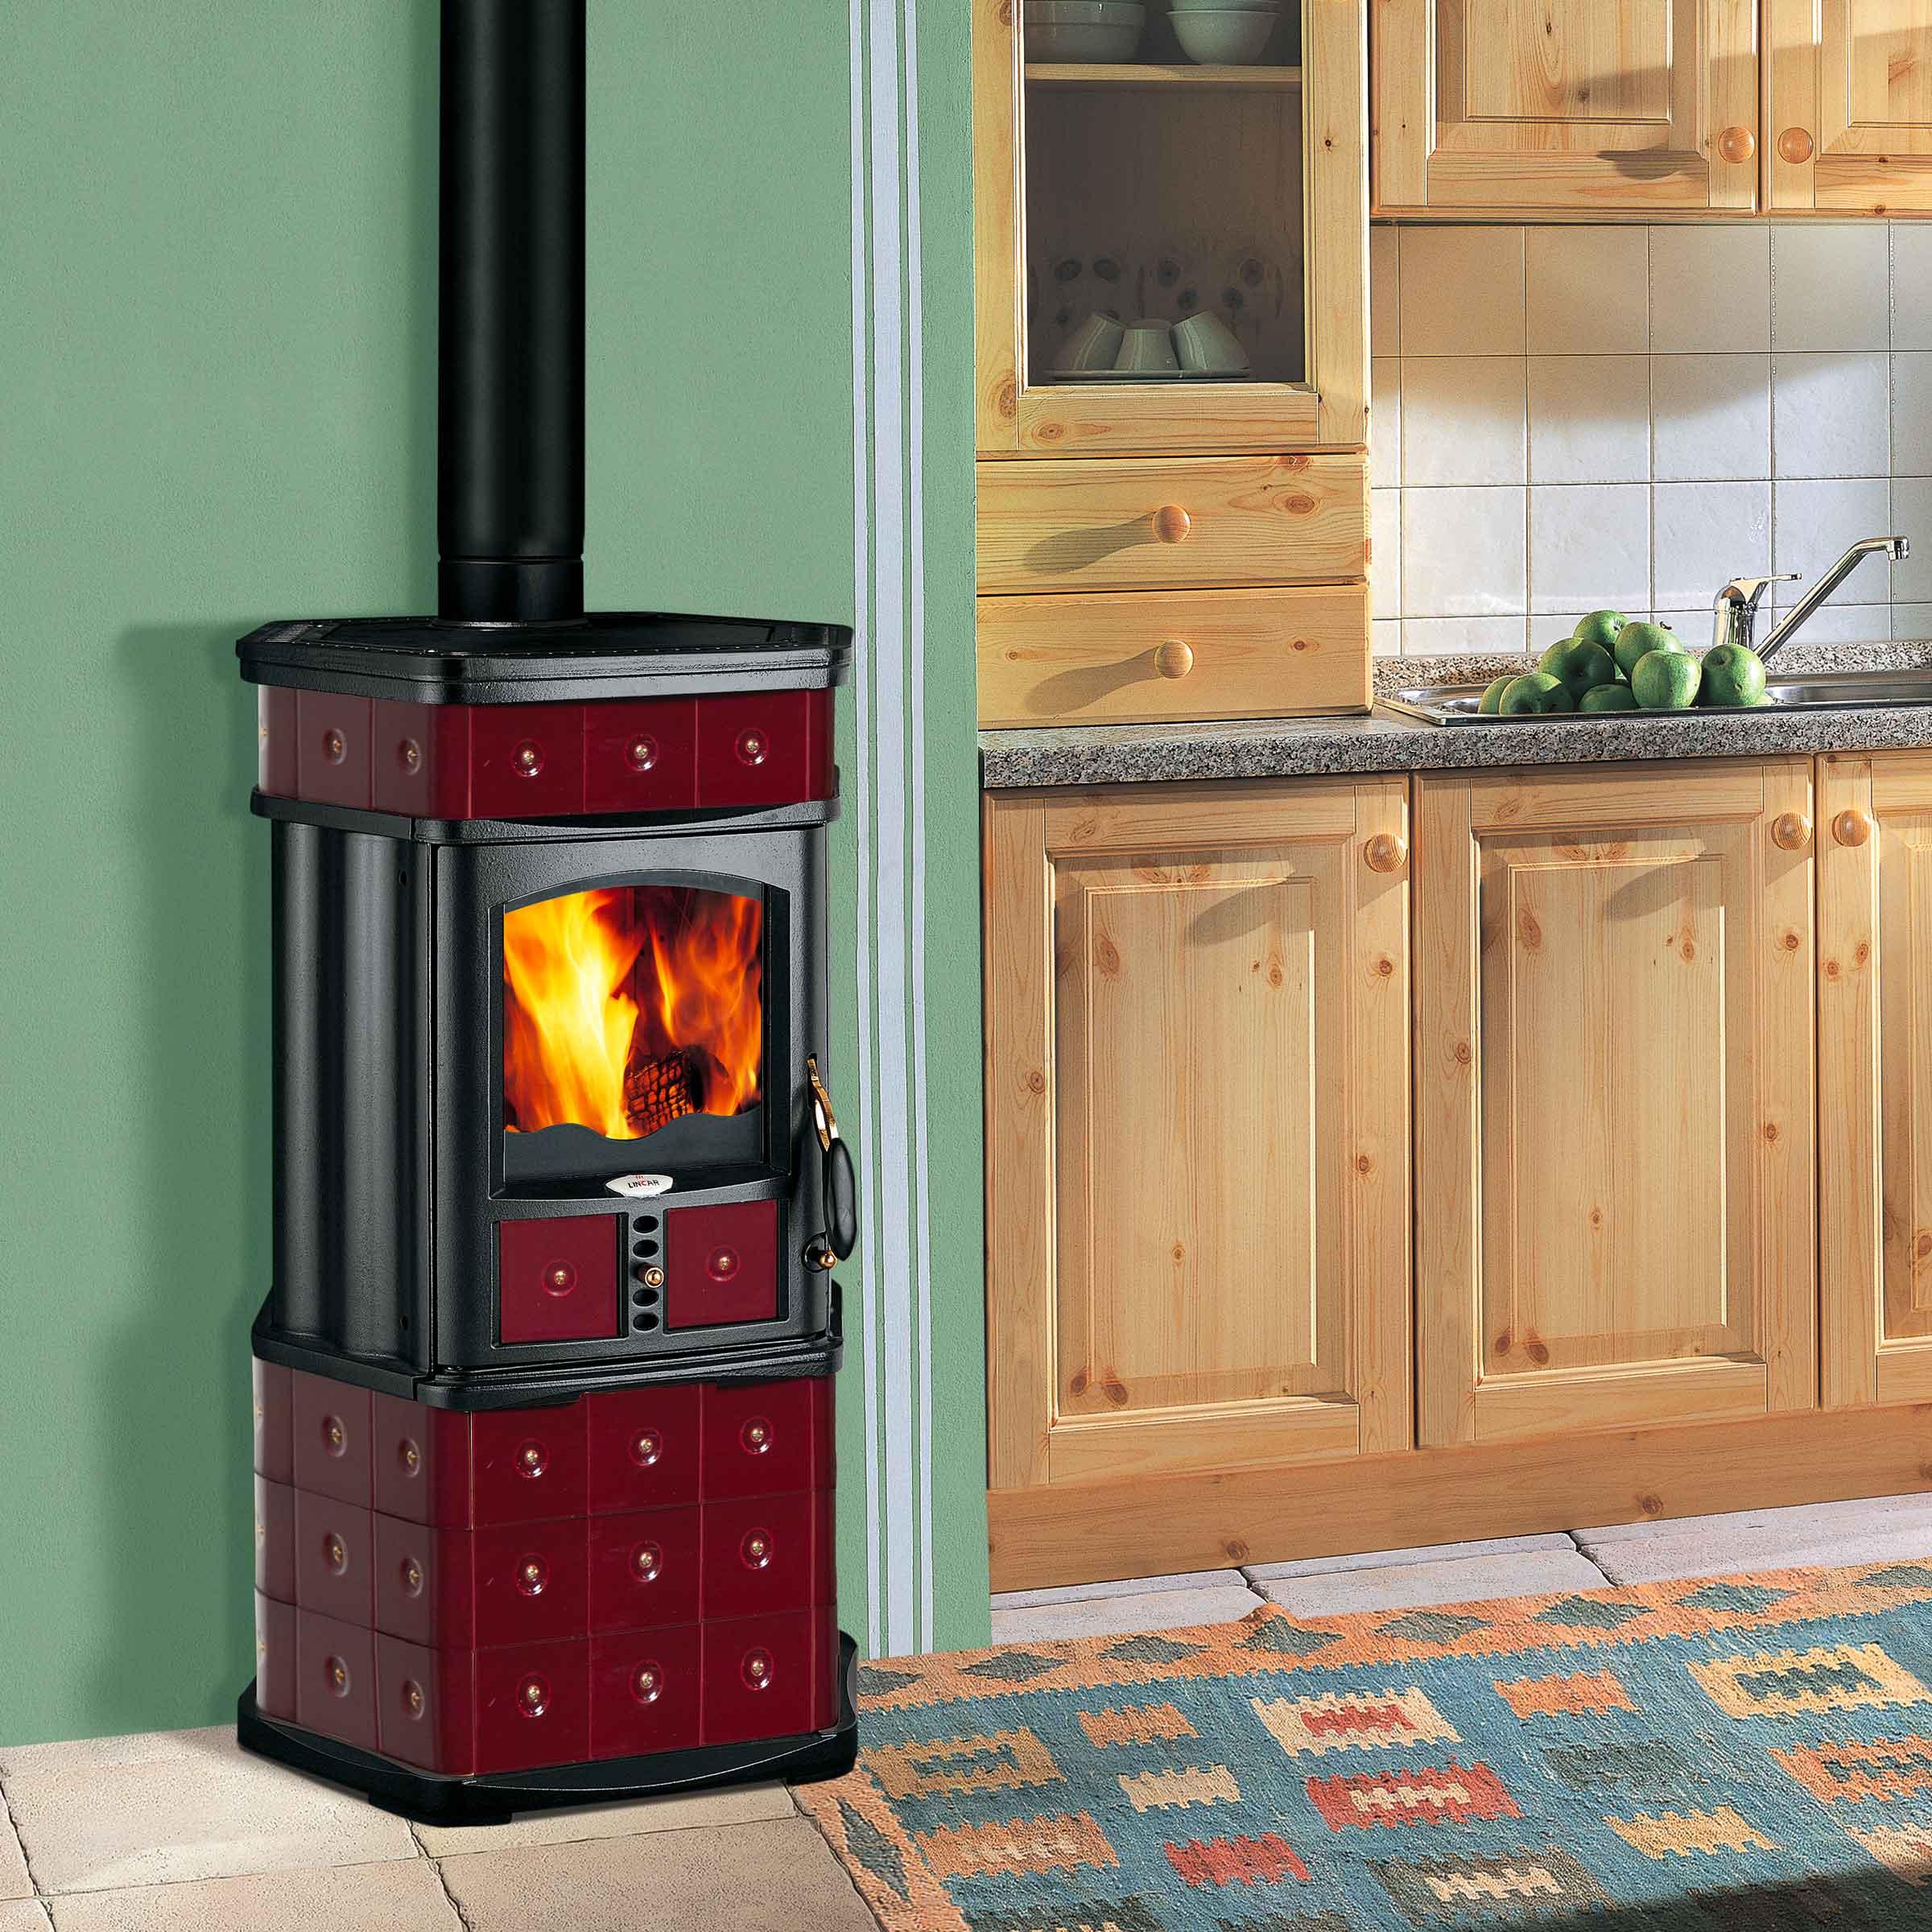 Stufe e termostufe a legna cb caminetti bellucci - Termostufe a pellet usate ...